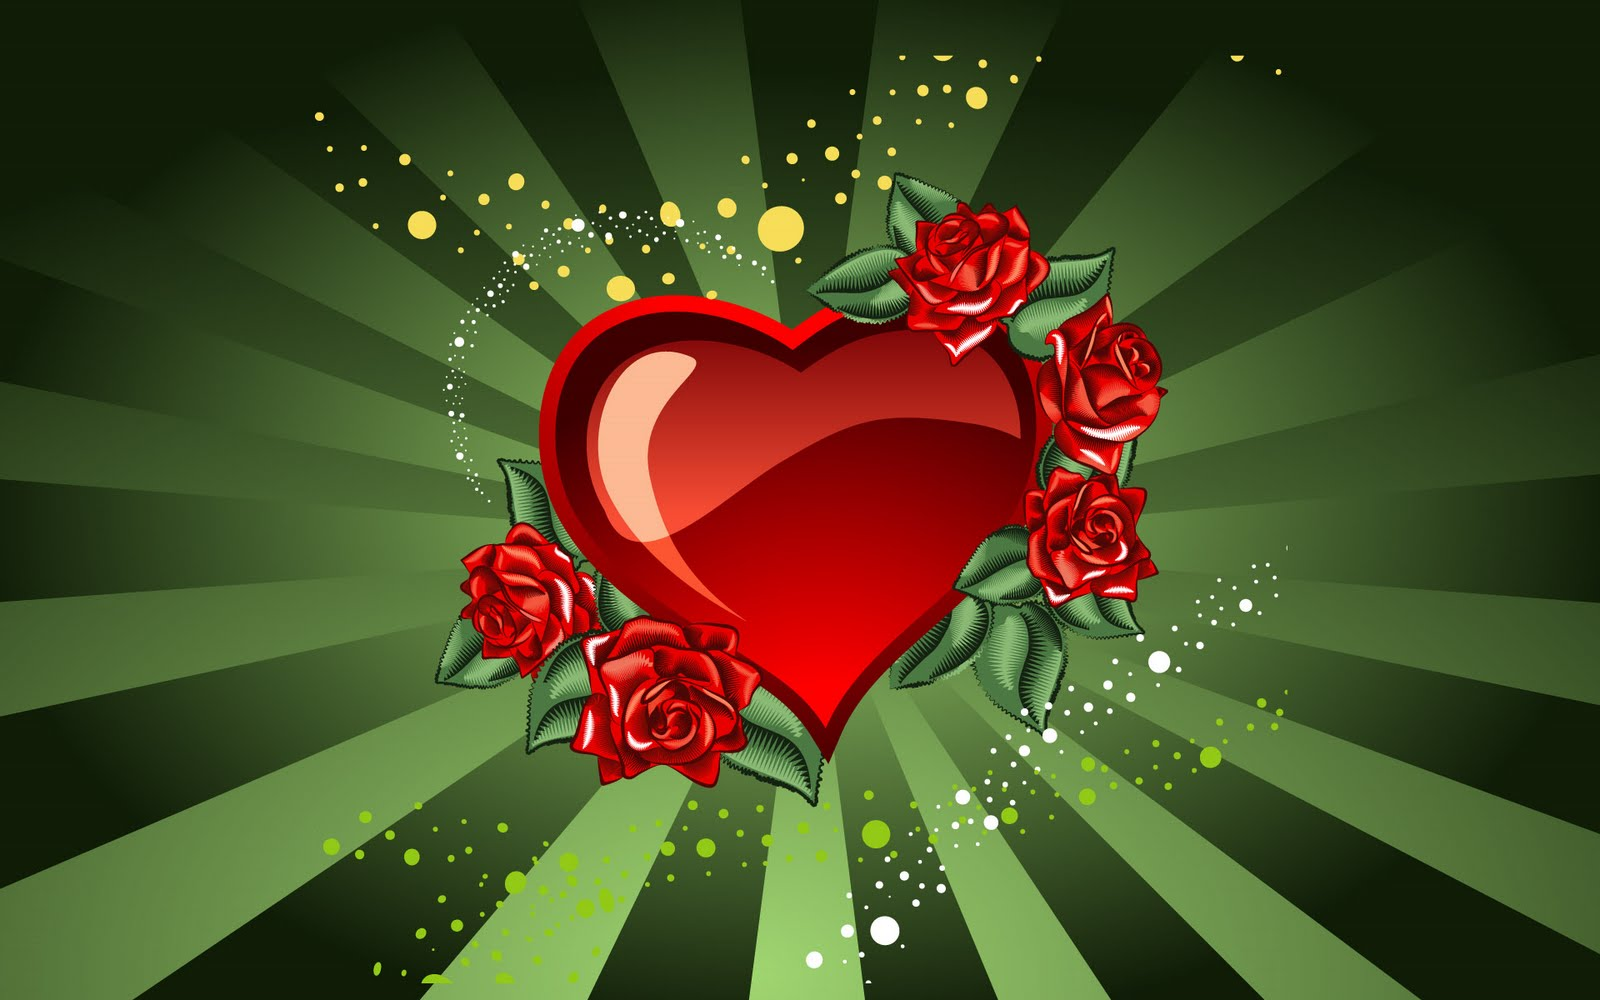 http://4.bp.blogspot.com/_Qc6aMdLT994/TErbK40MG7I/AAAAAAAAFqo/attMhjf8HmE/s1600/12.jpg